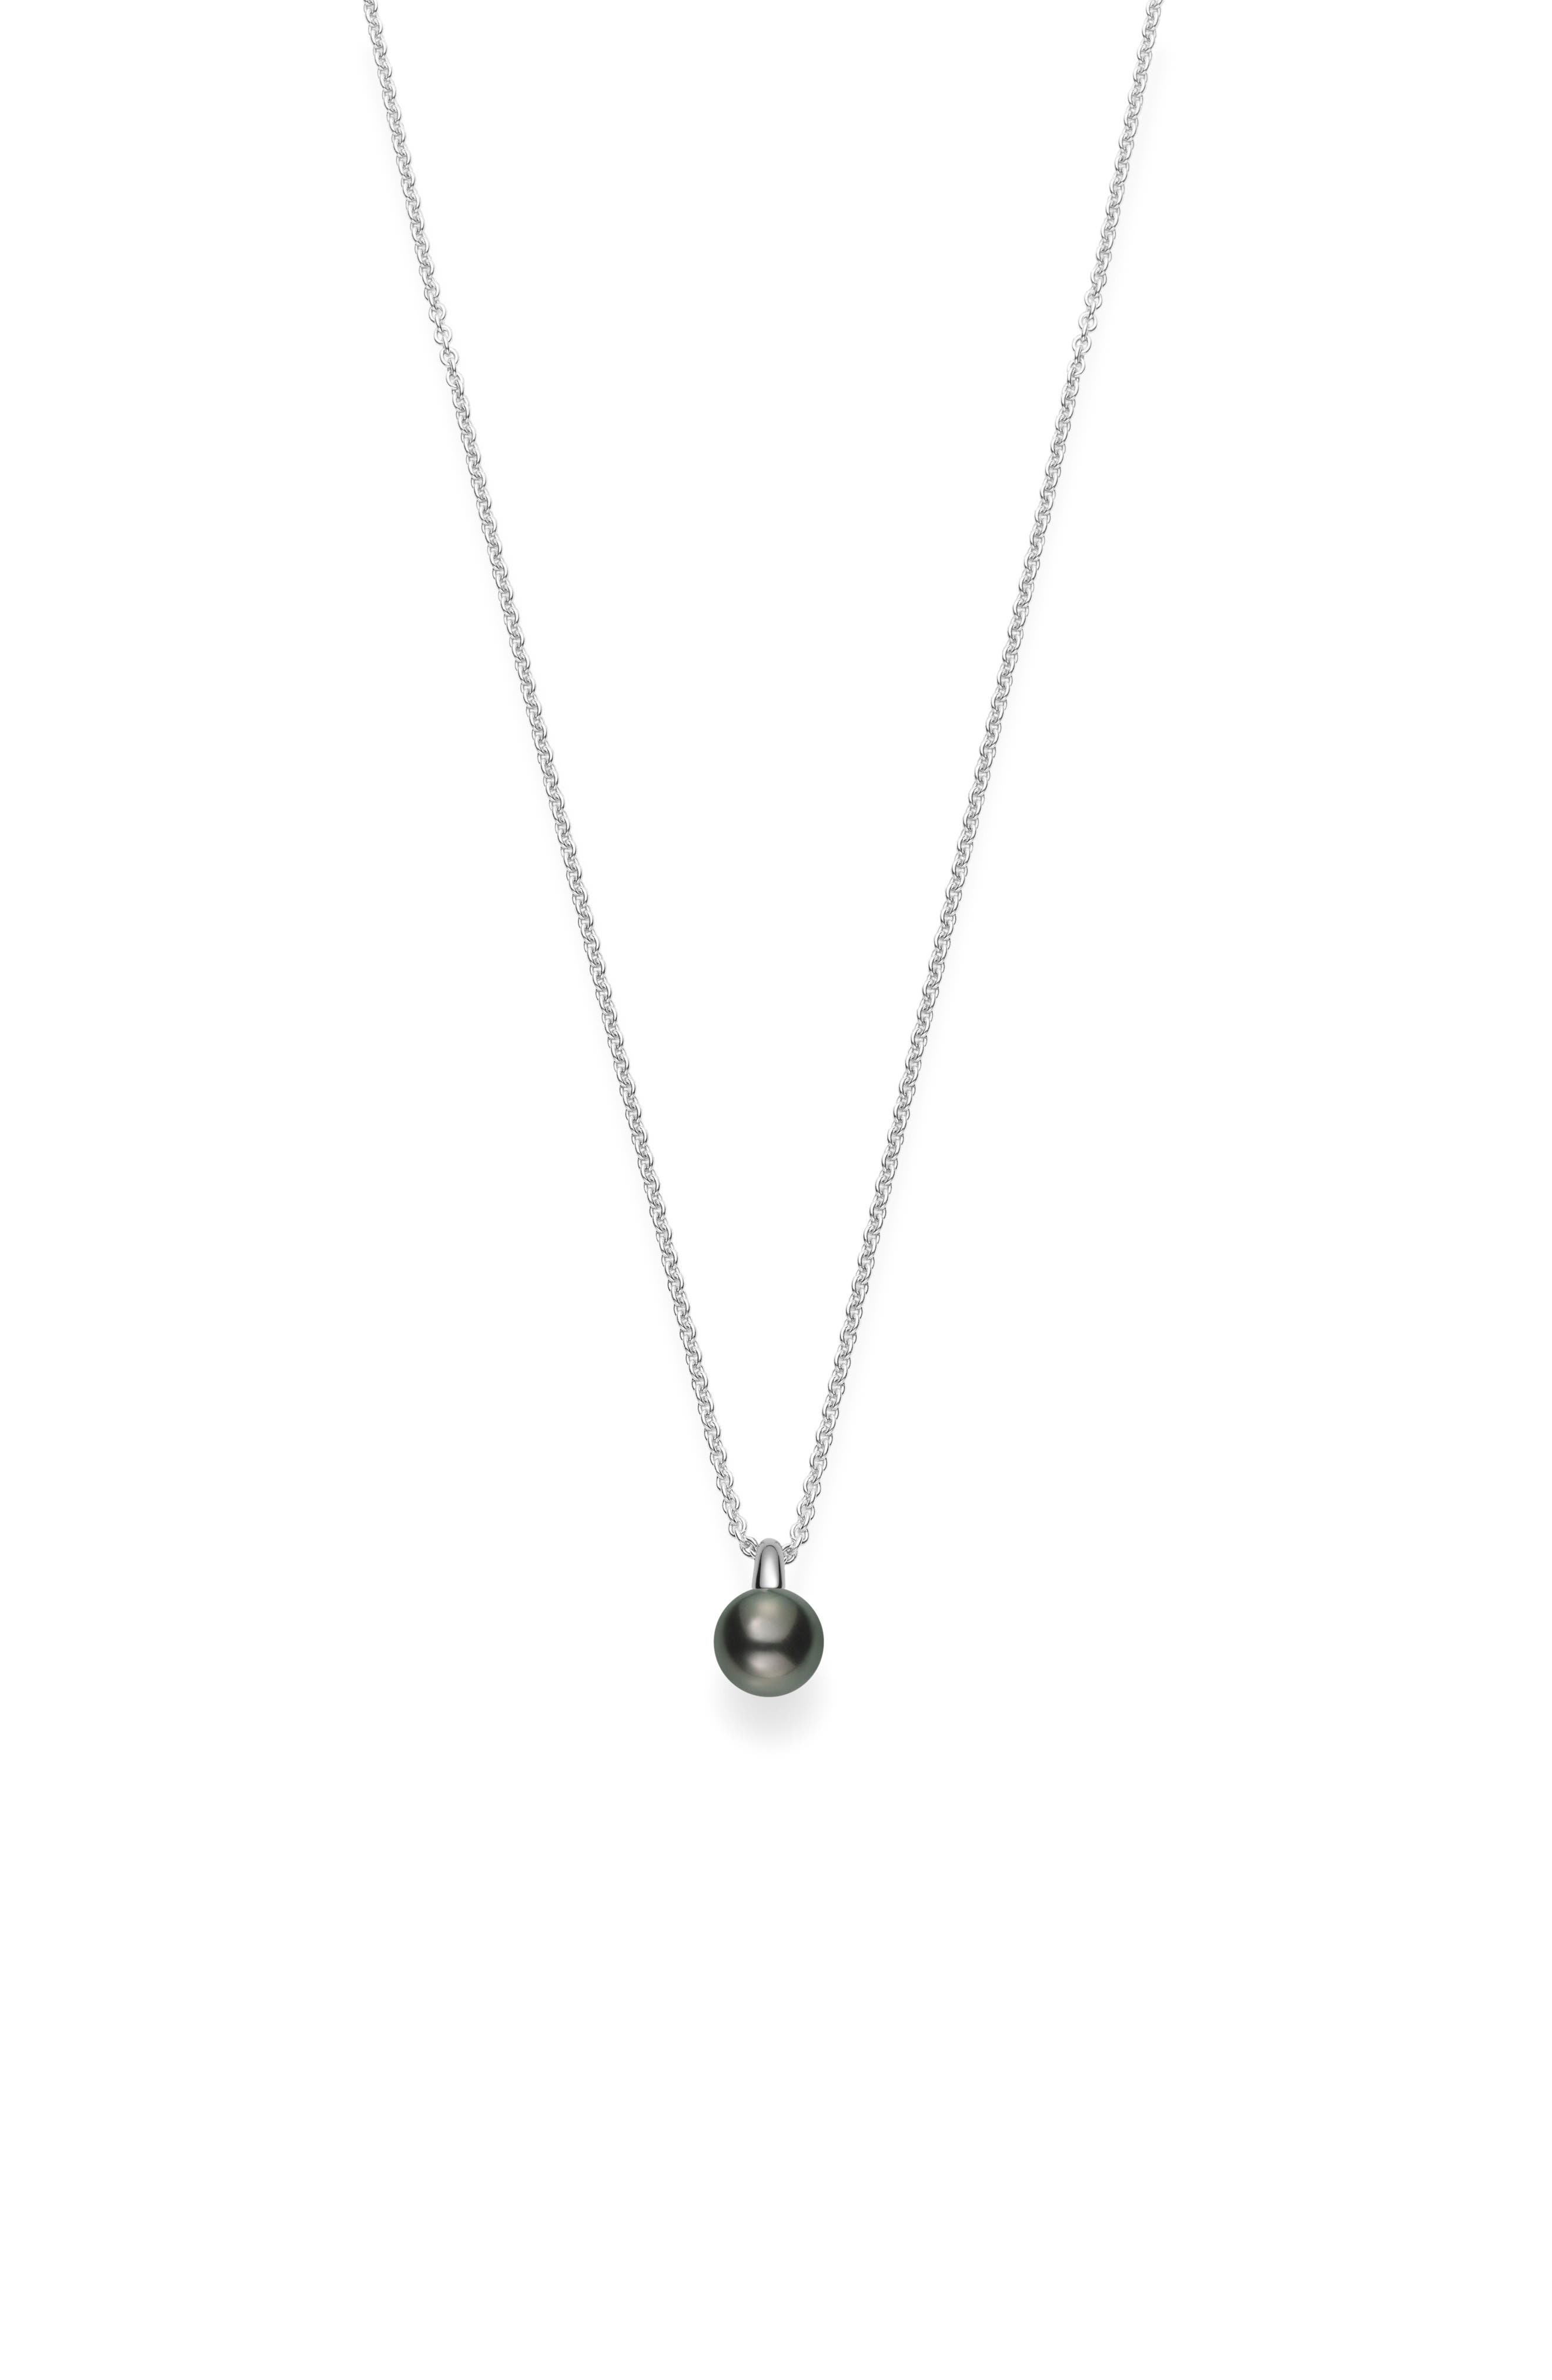 Classic Black Pearl Pendant Necklace,                             Main thumbnail 1, color,                             WHITE GOLD